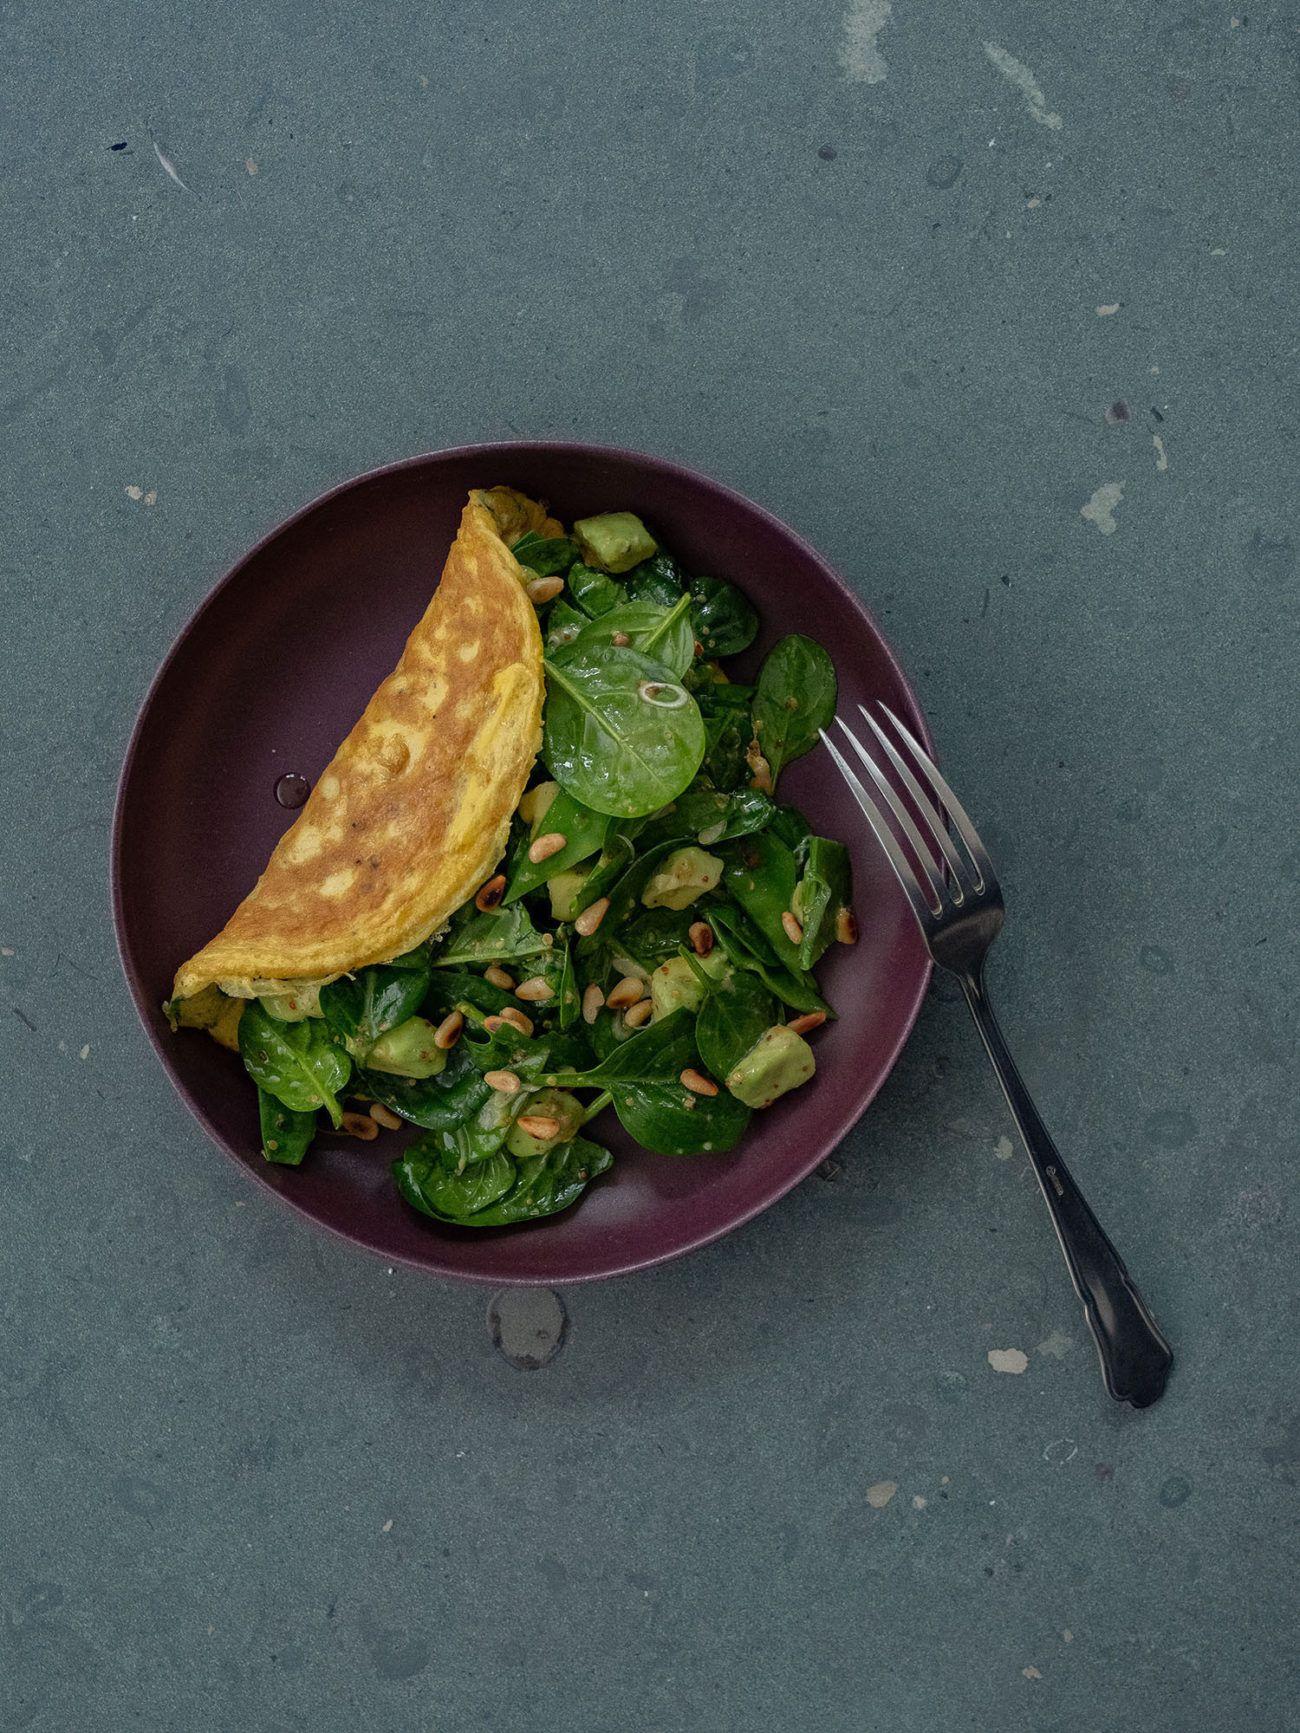 Rezept Omelett mit Spinatsalat, Teller, Gabel, Salat